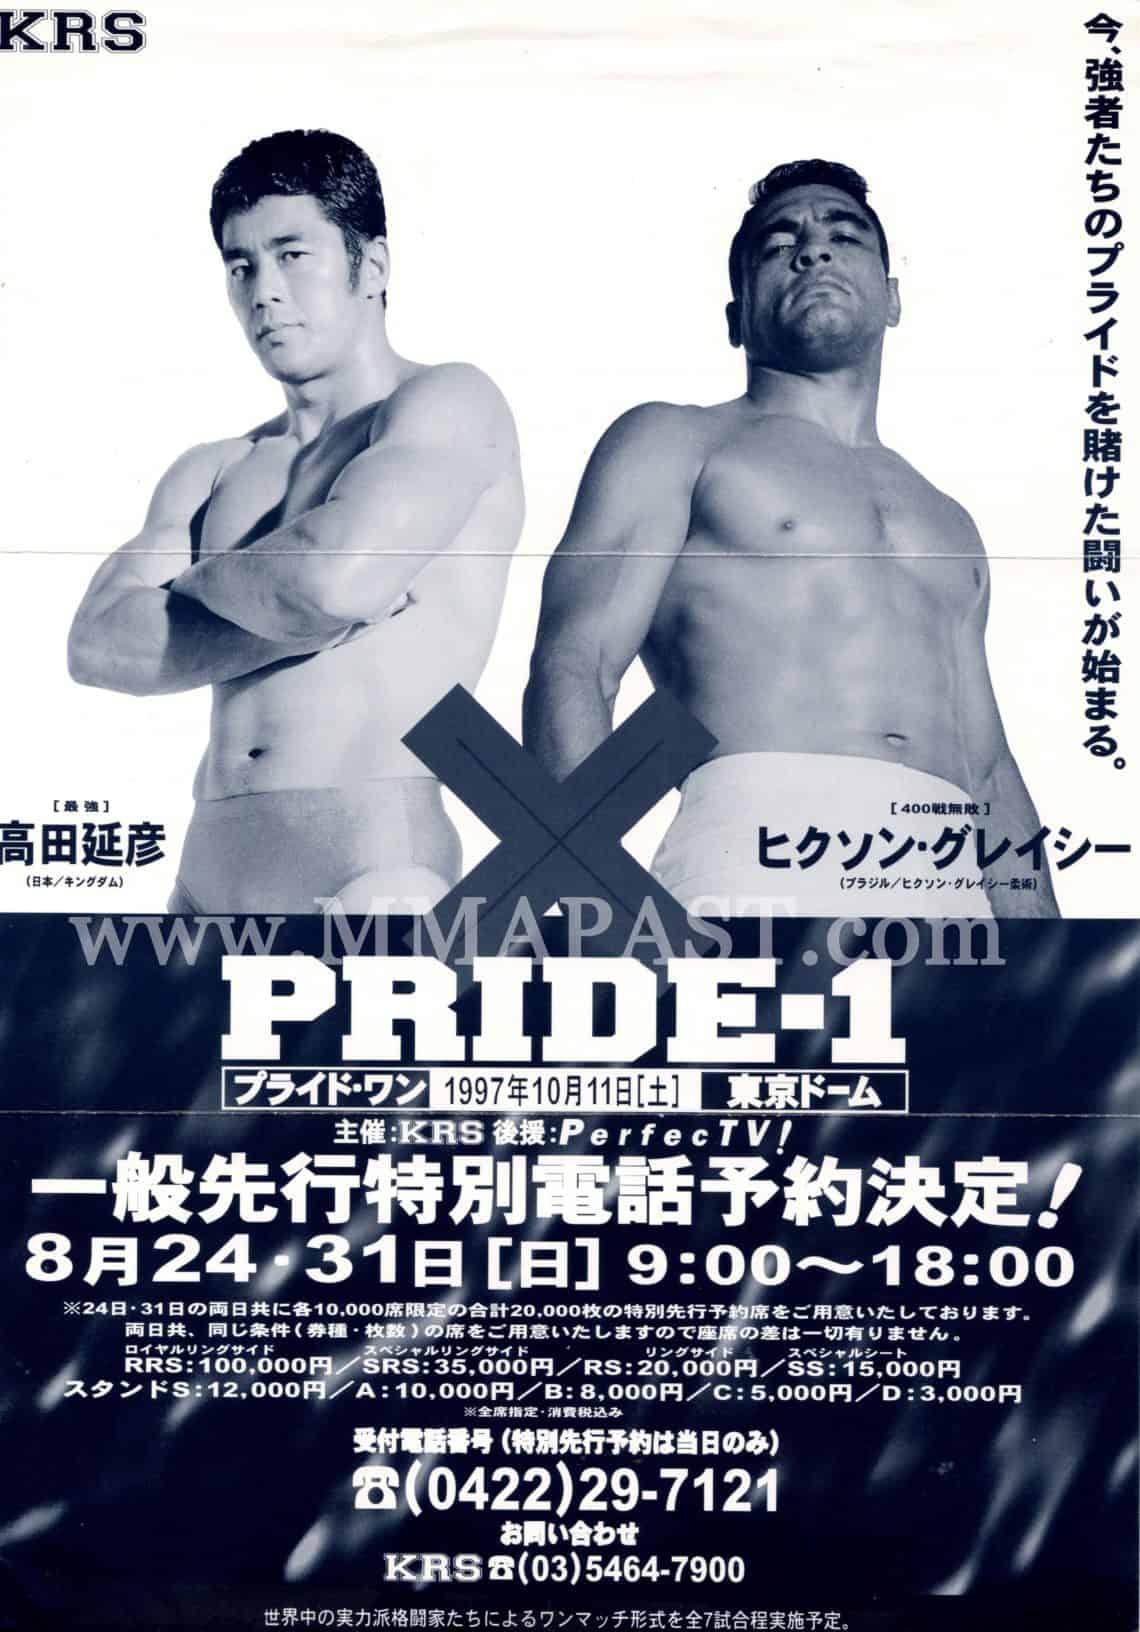 Pride FC 1: Rickson Gracie vs Nobuhiko Takada (Tokyo 1997) 2